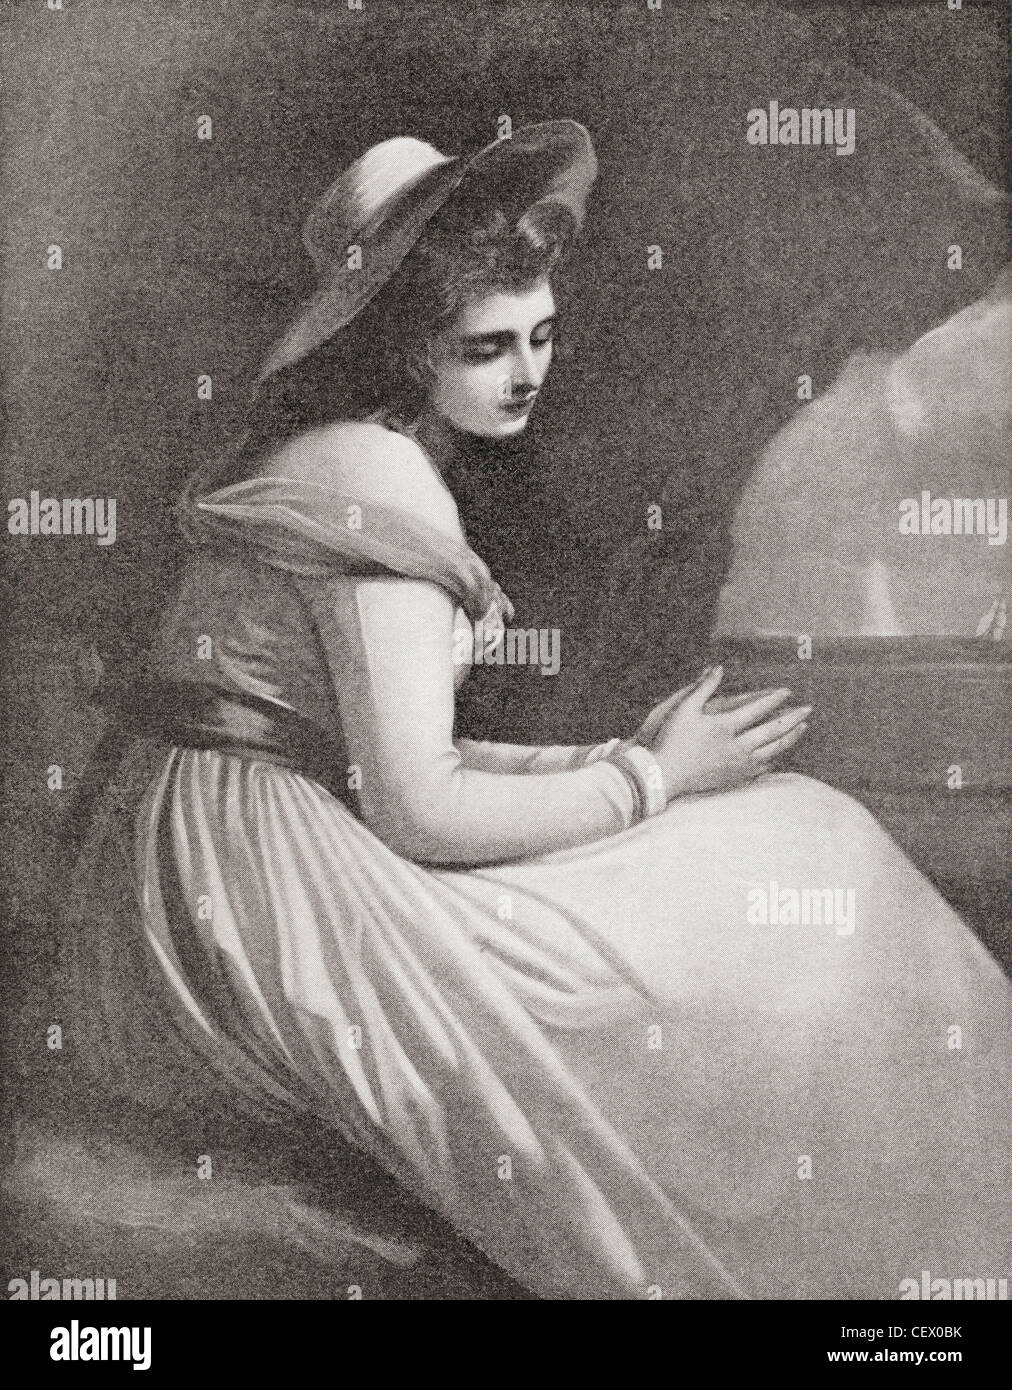 Emma, Lady Hamilton, 1765 - 1815. Mistress of Lord Nelson. From The Strand Magazine published 1897. - Stock Image